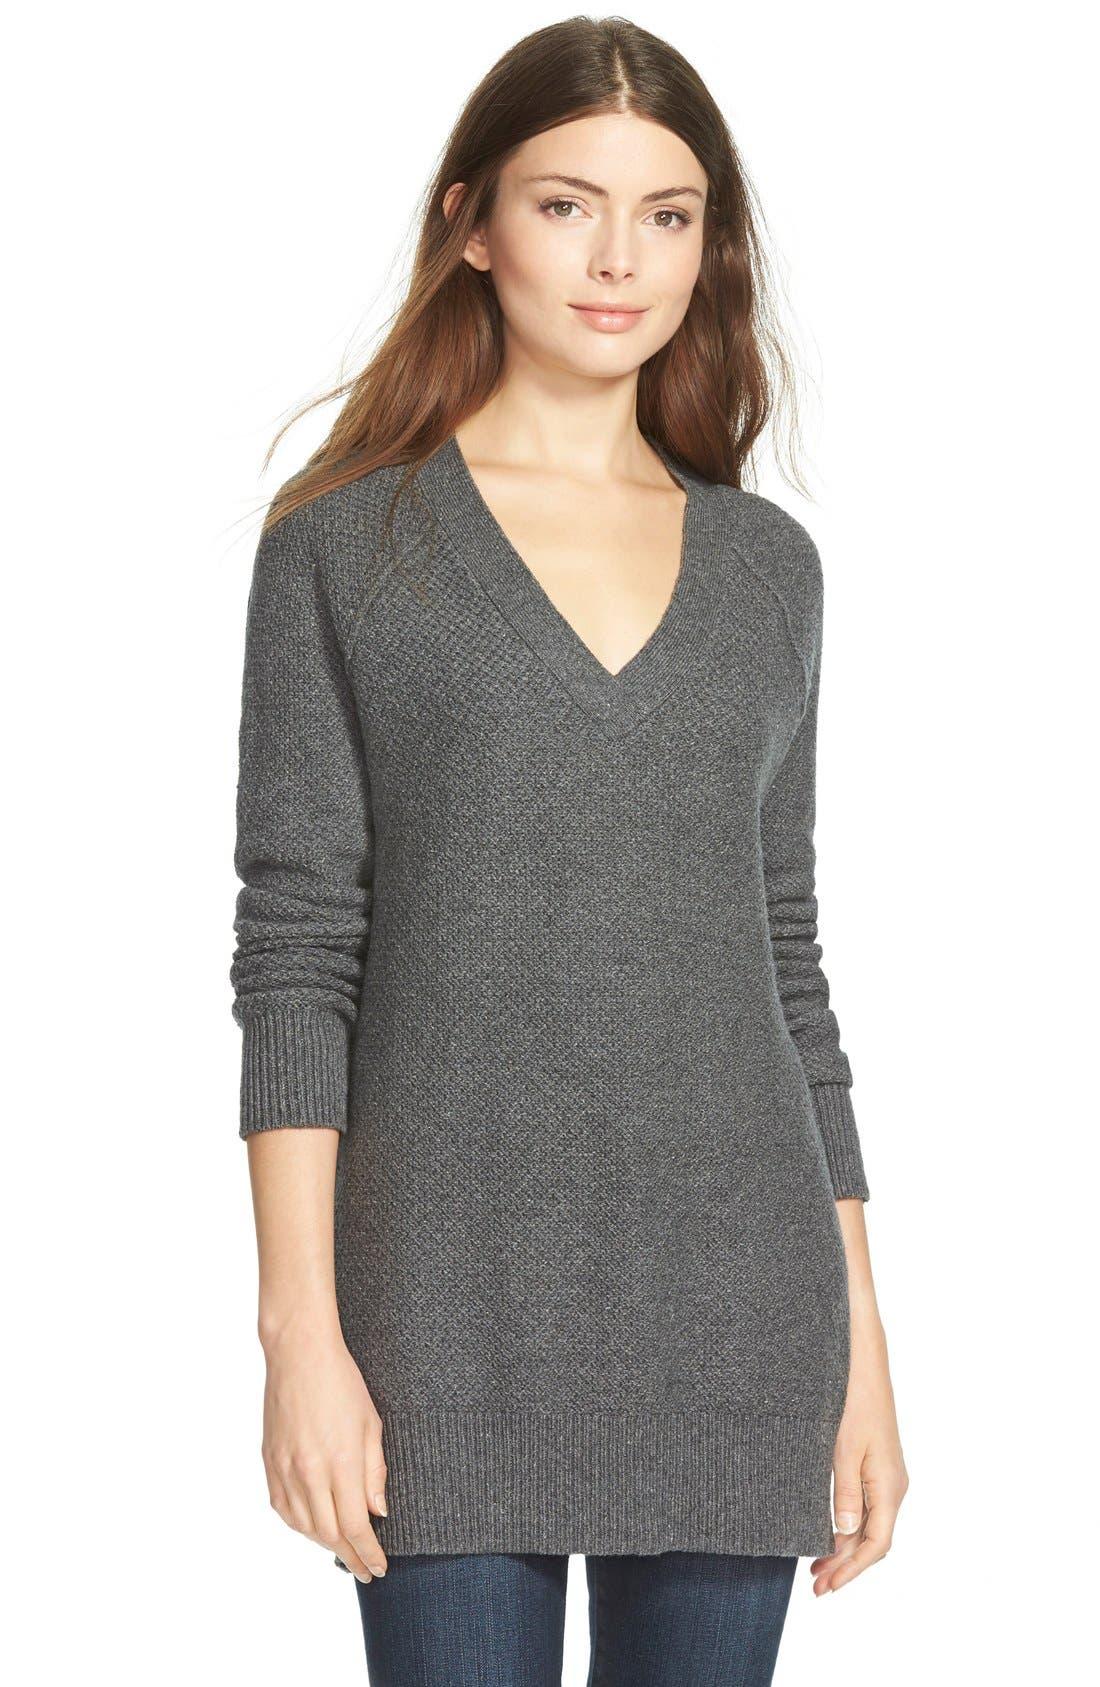 TREASURE & BOND Treasure&Bond Oversize V-Neck Sweater, Main, color, 020